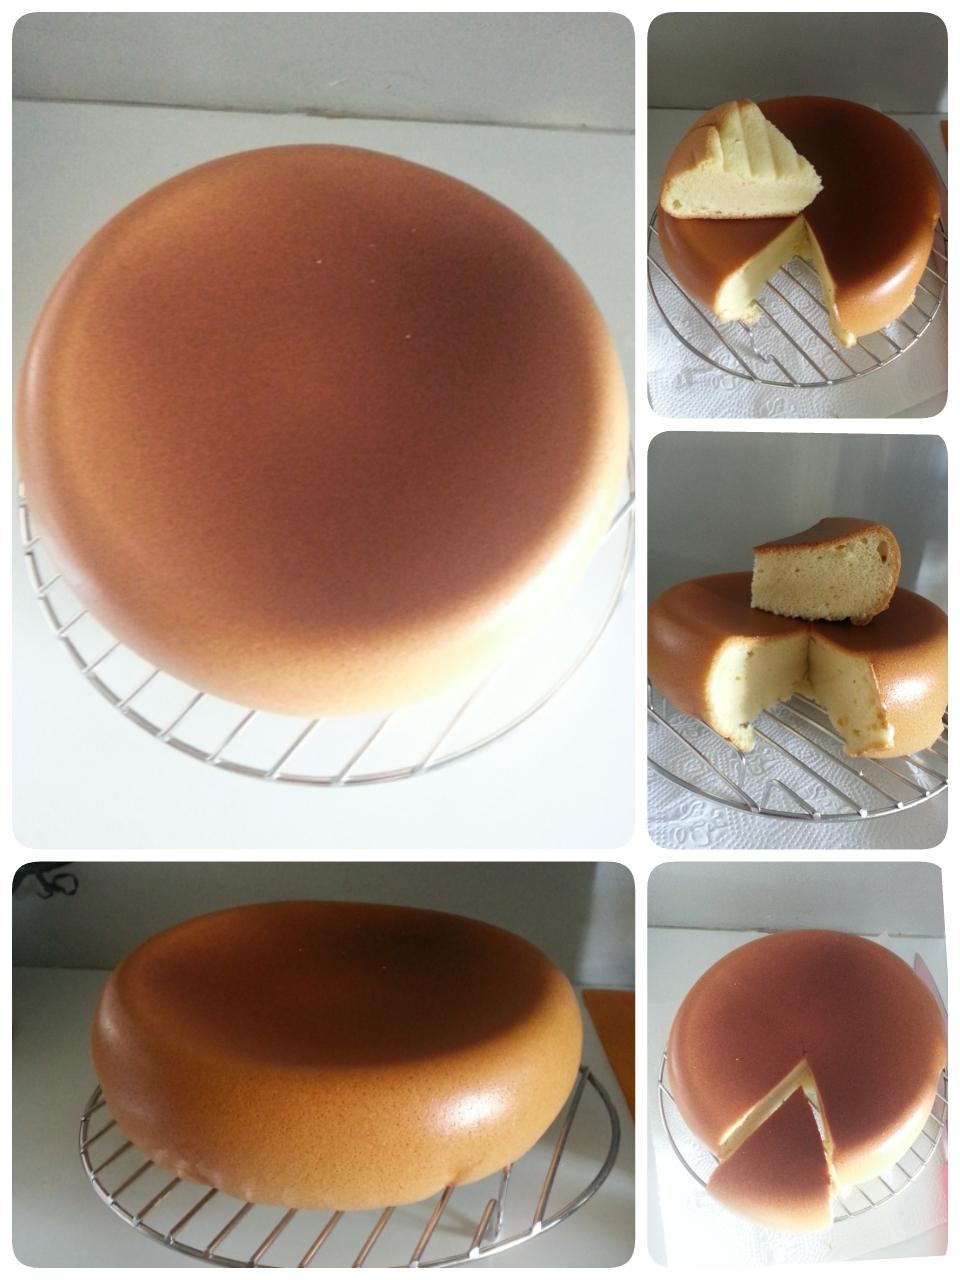 Baking Chocolate Cake In Rice Cooker